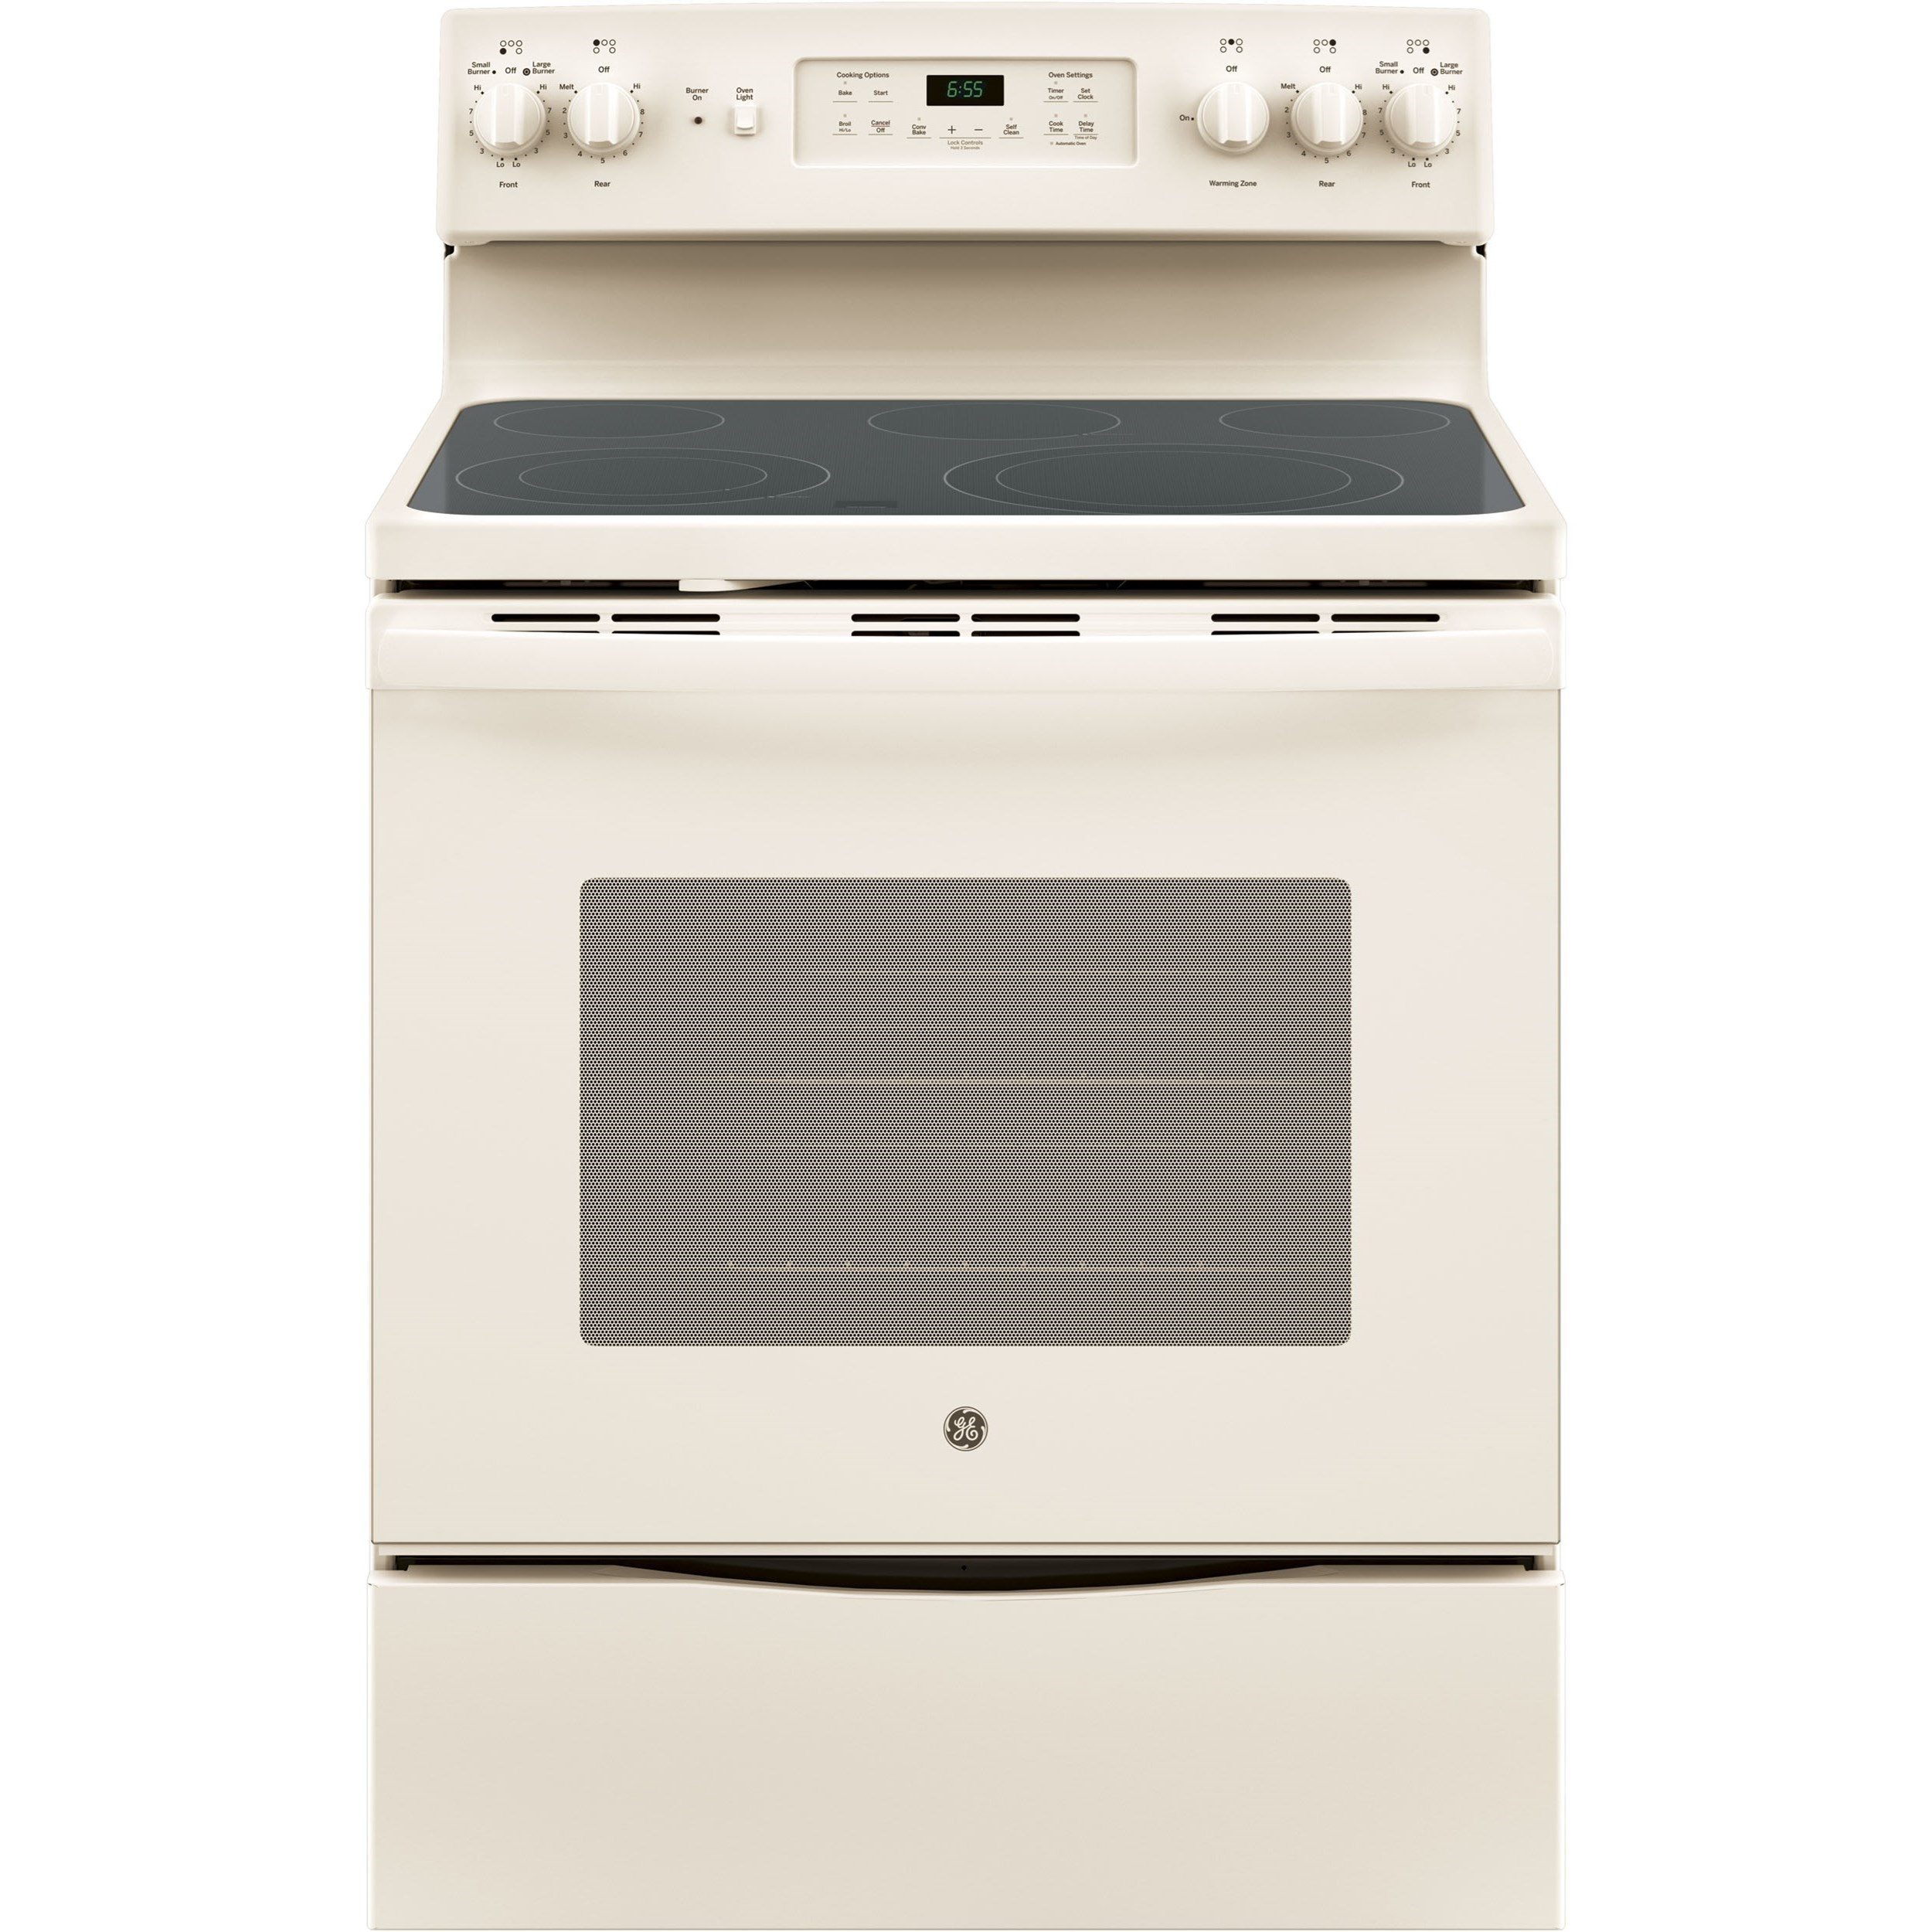 "GE Appliances GE Electric Ranges 30"" Free-Standing Convection Electric Range - Item Number: JB655DKCC"